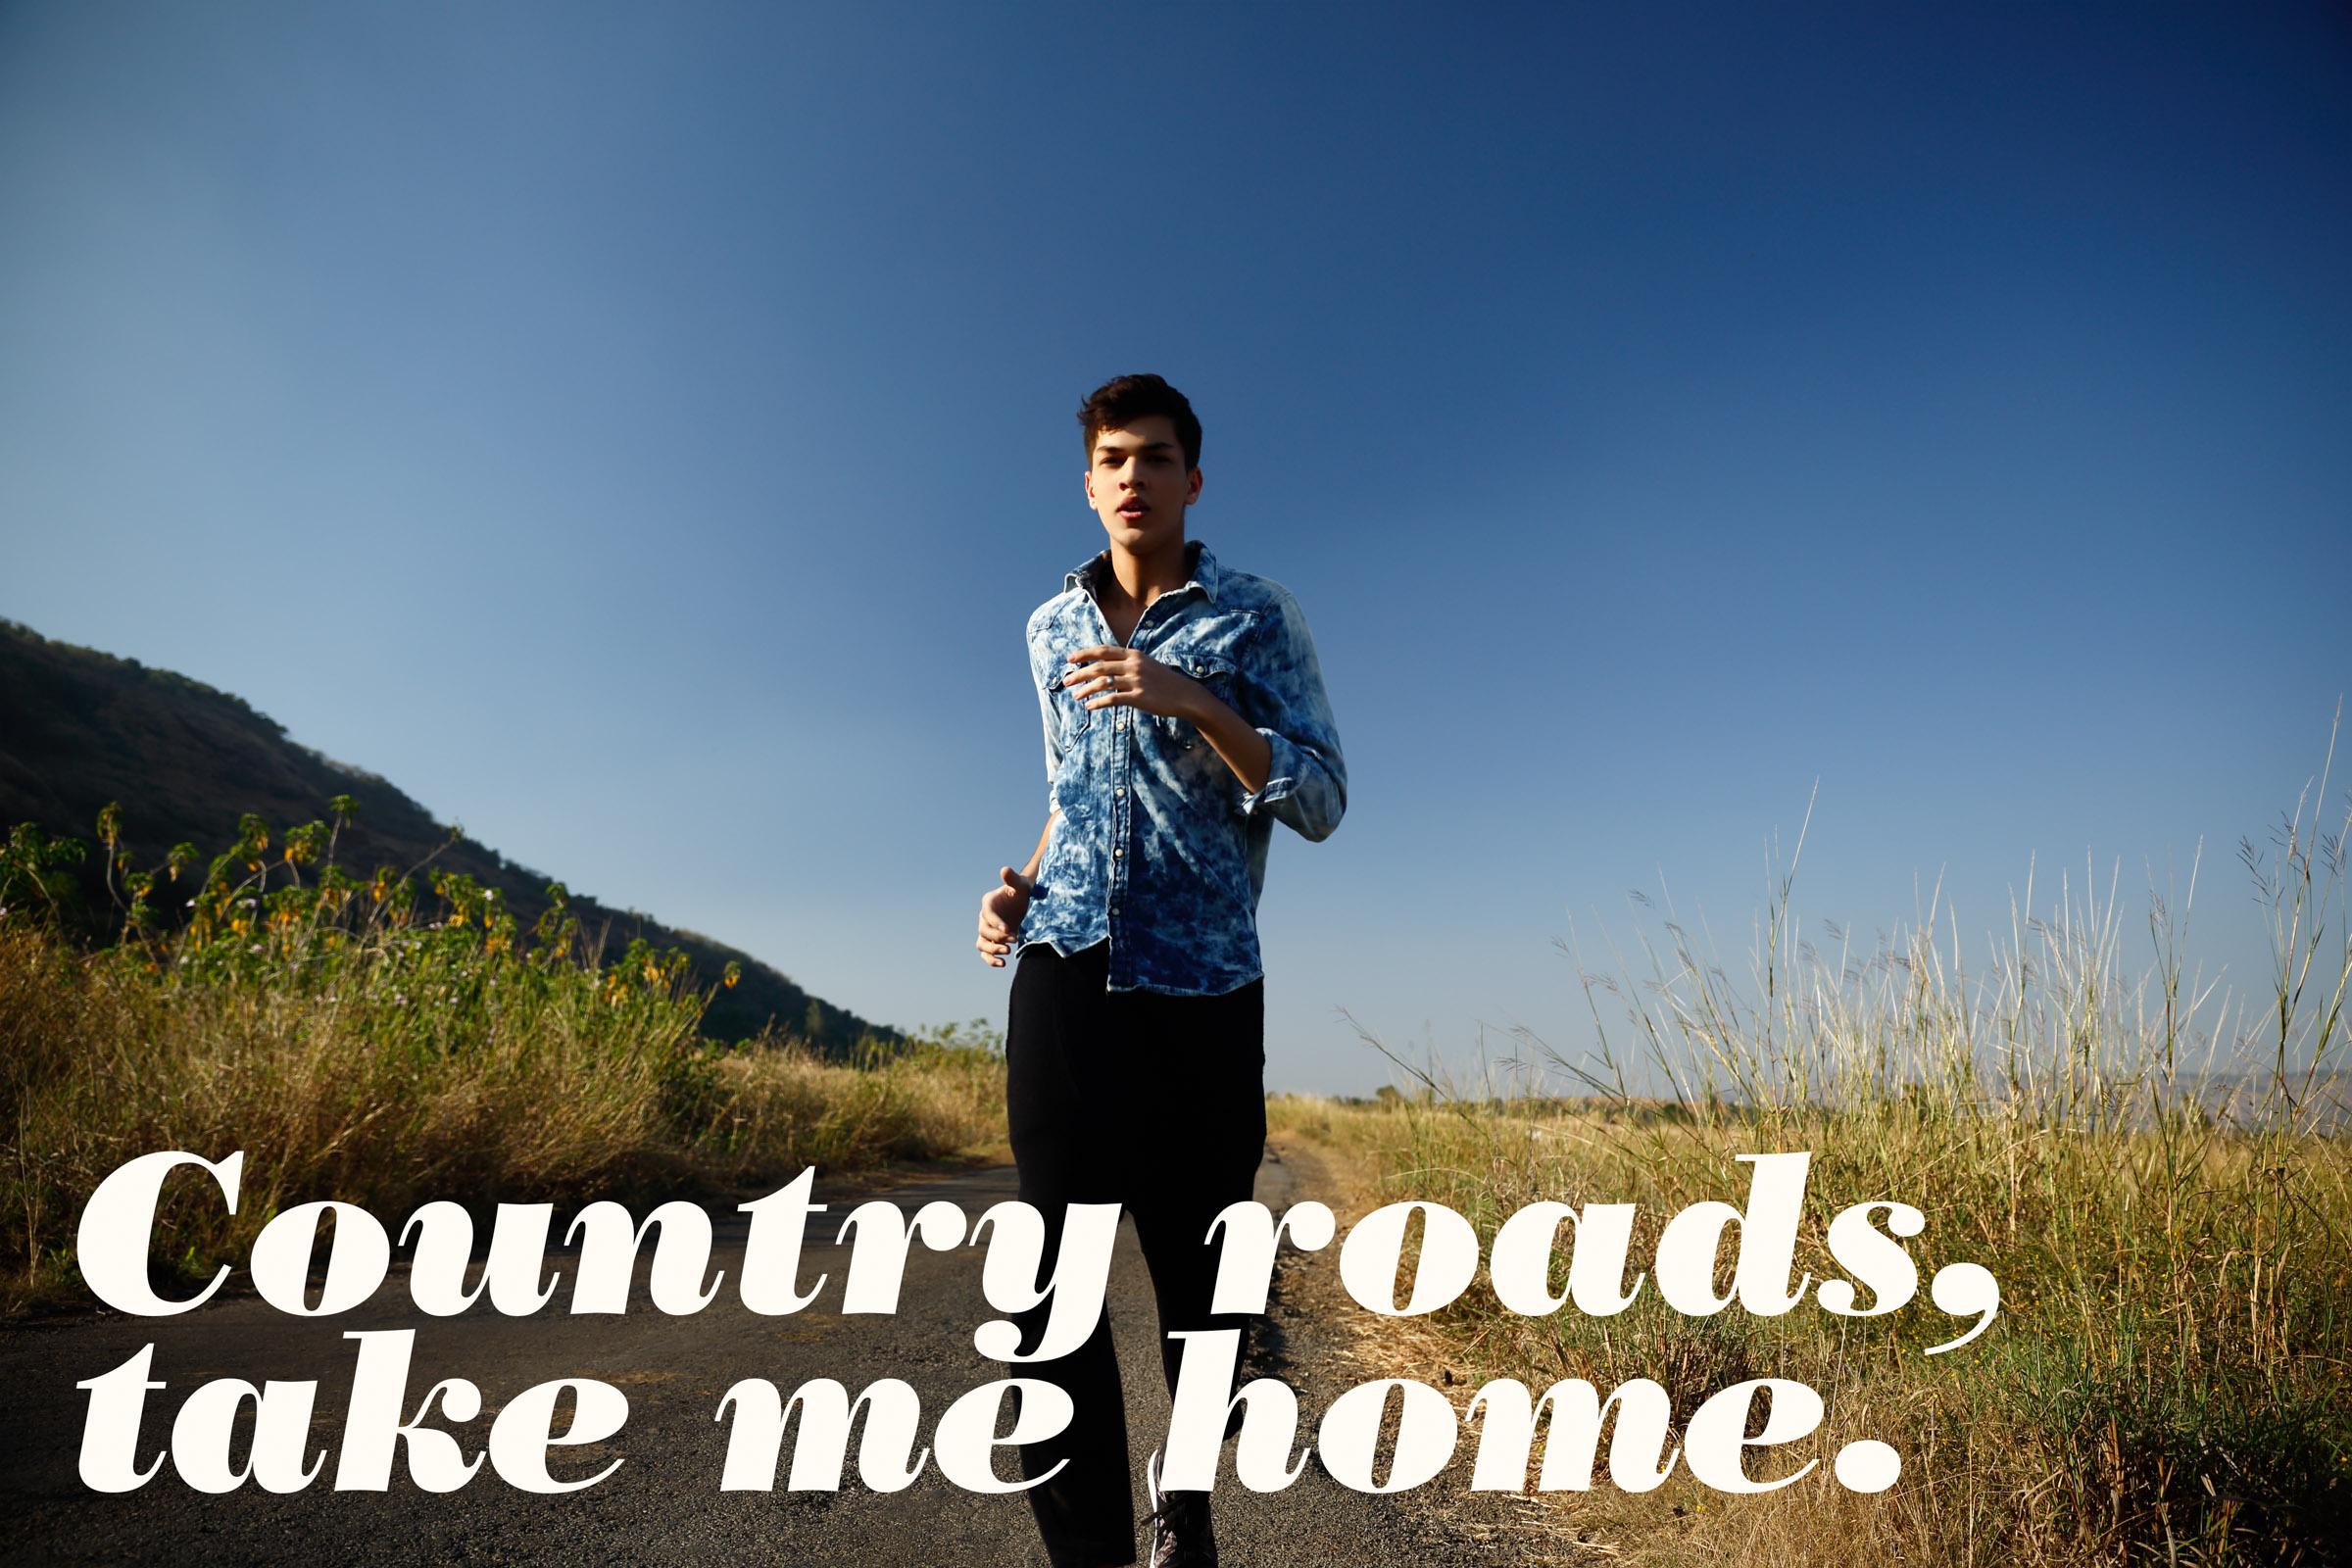 Kriator-Photographer-Country Roads_01.jpg